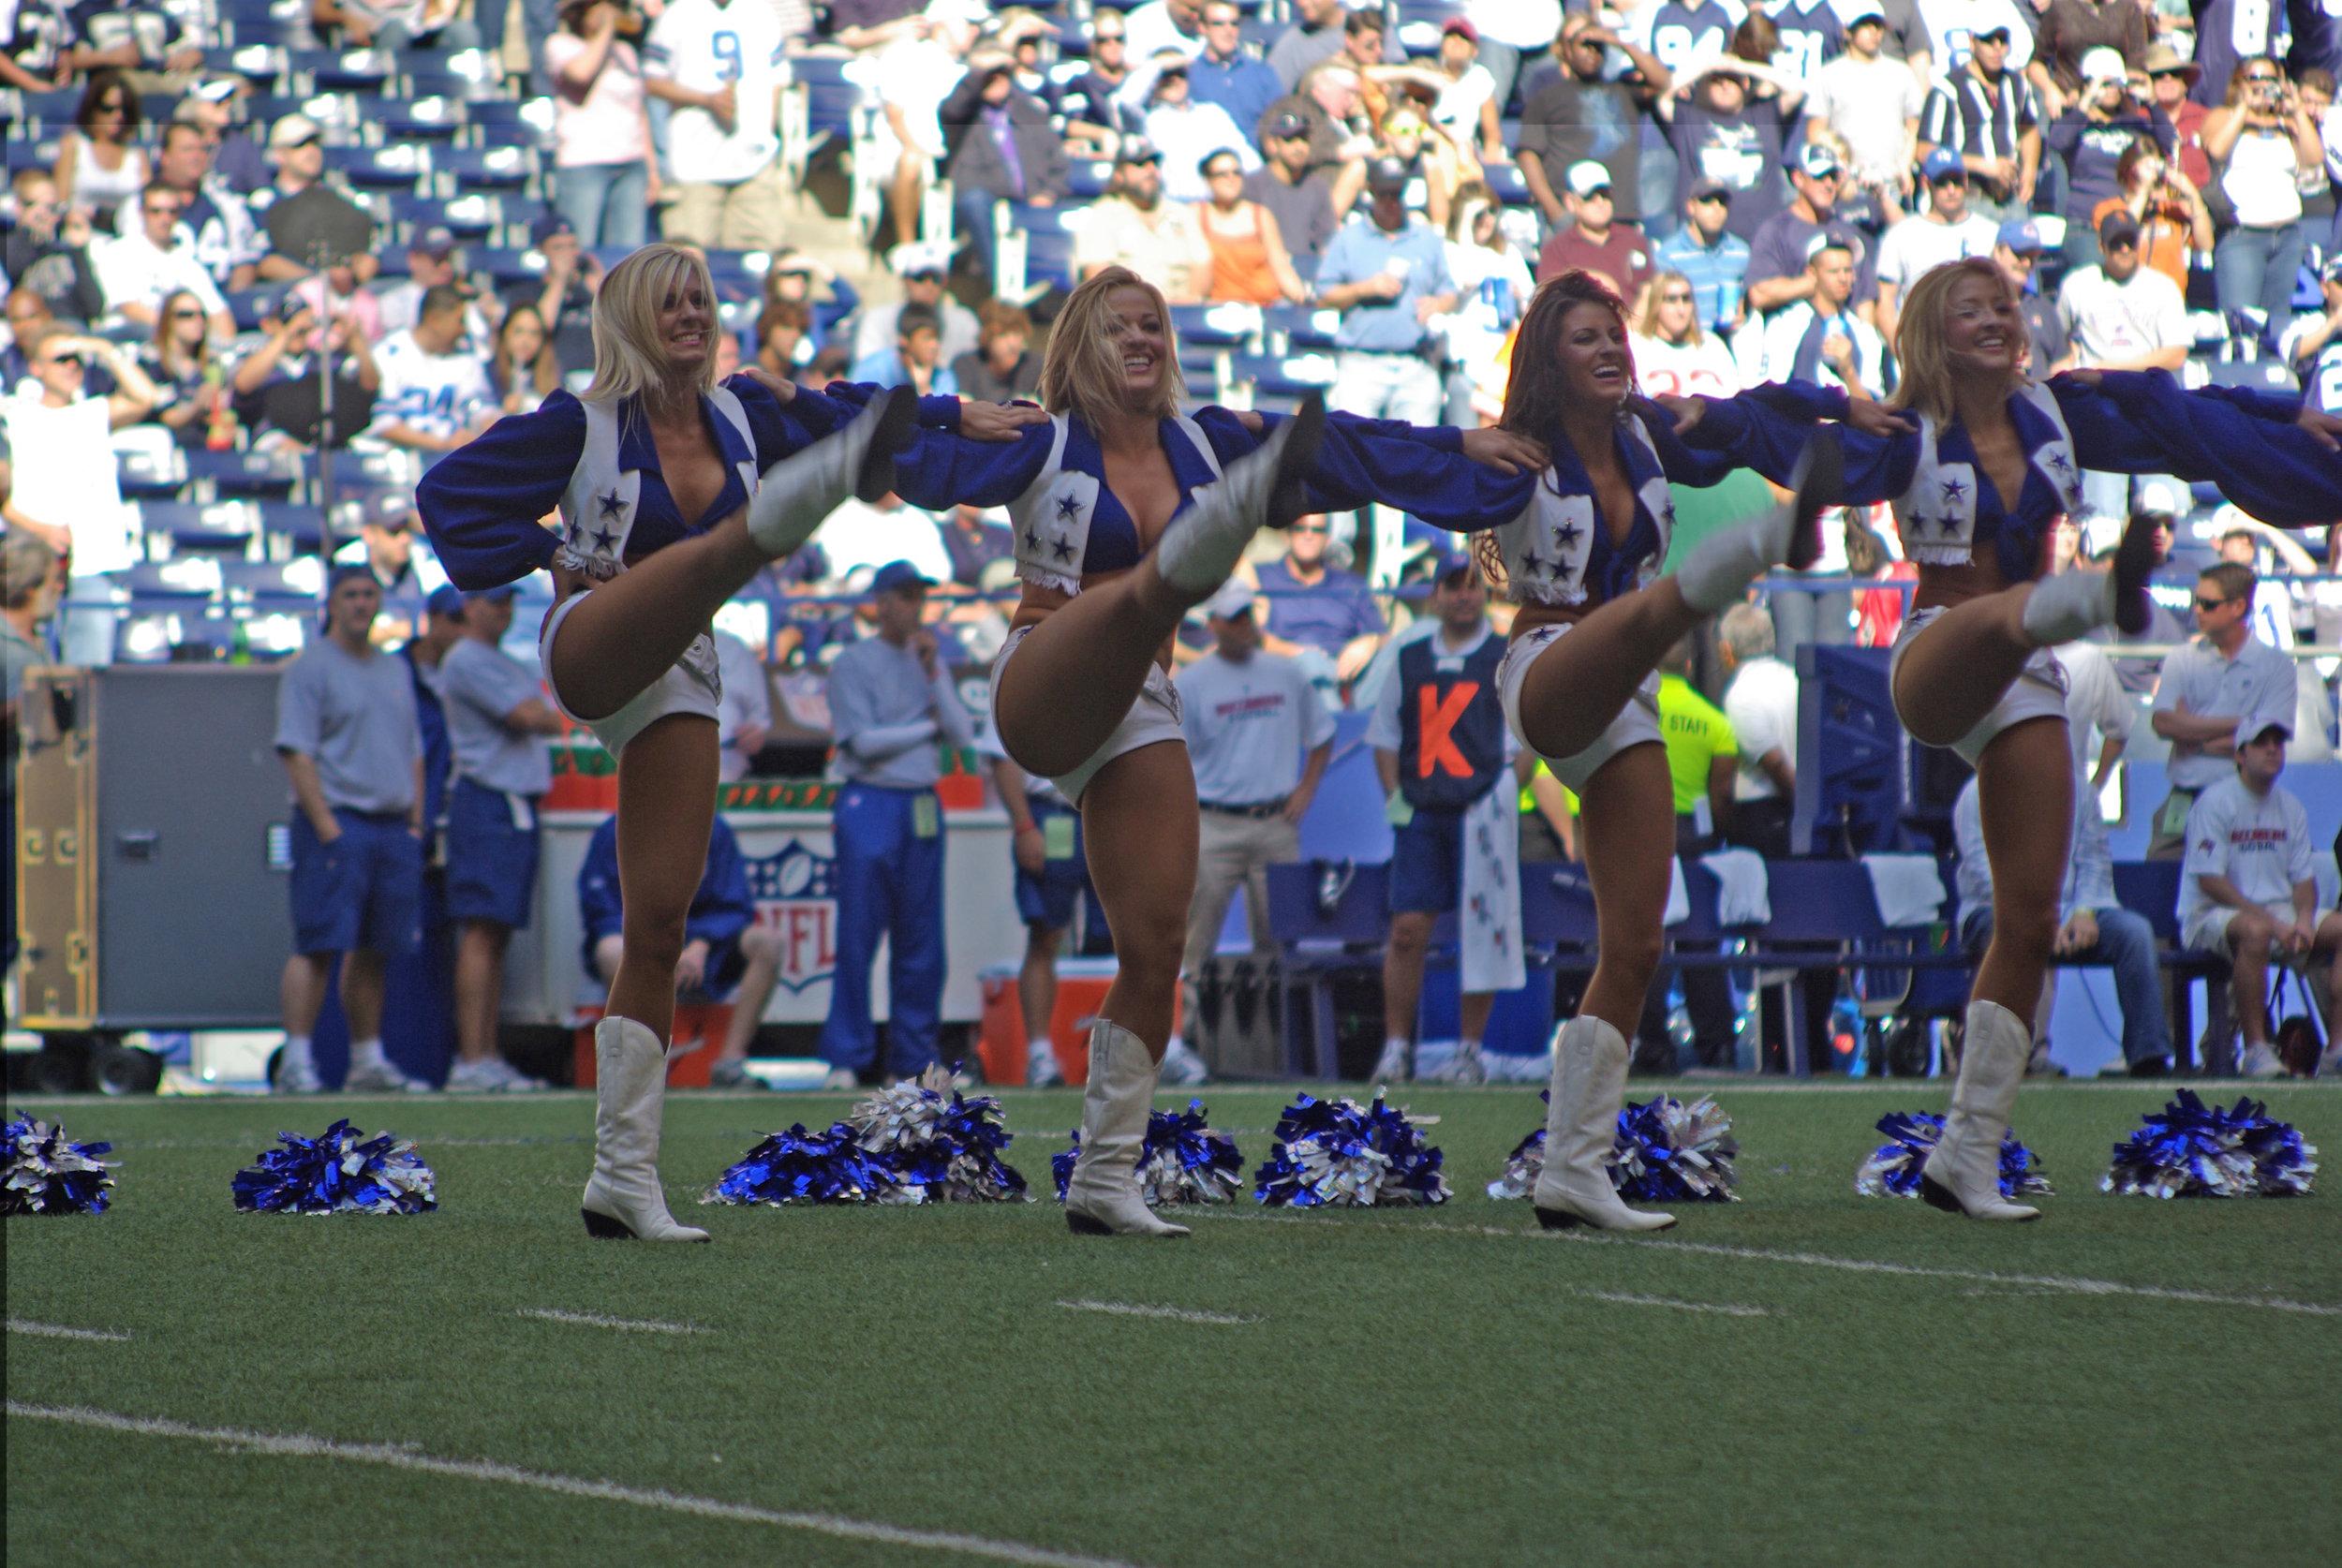 dallas cowboys football.jpg